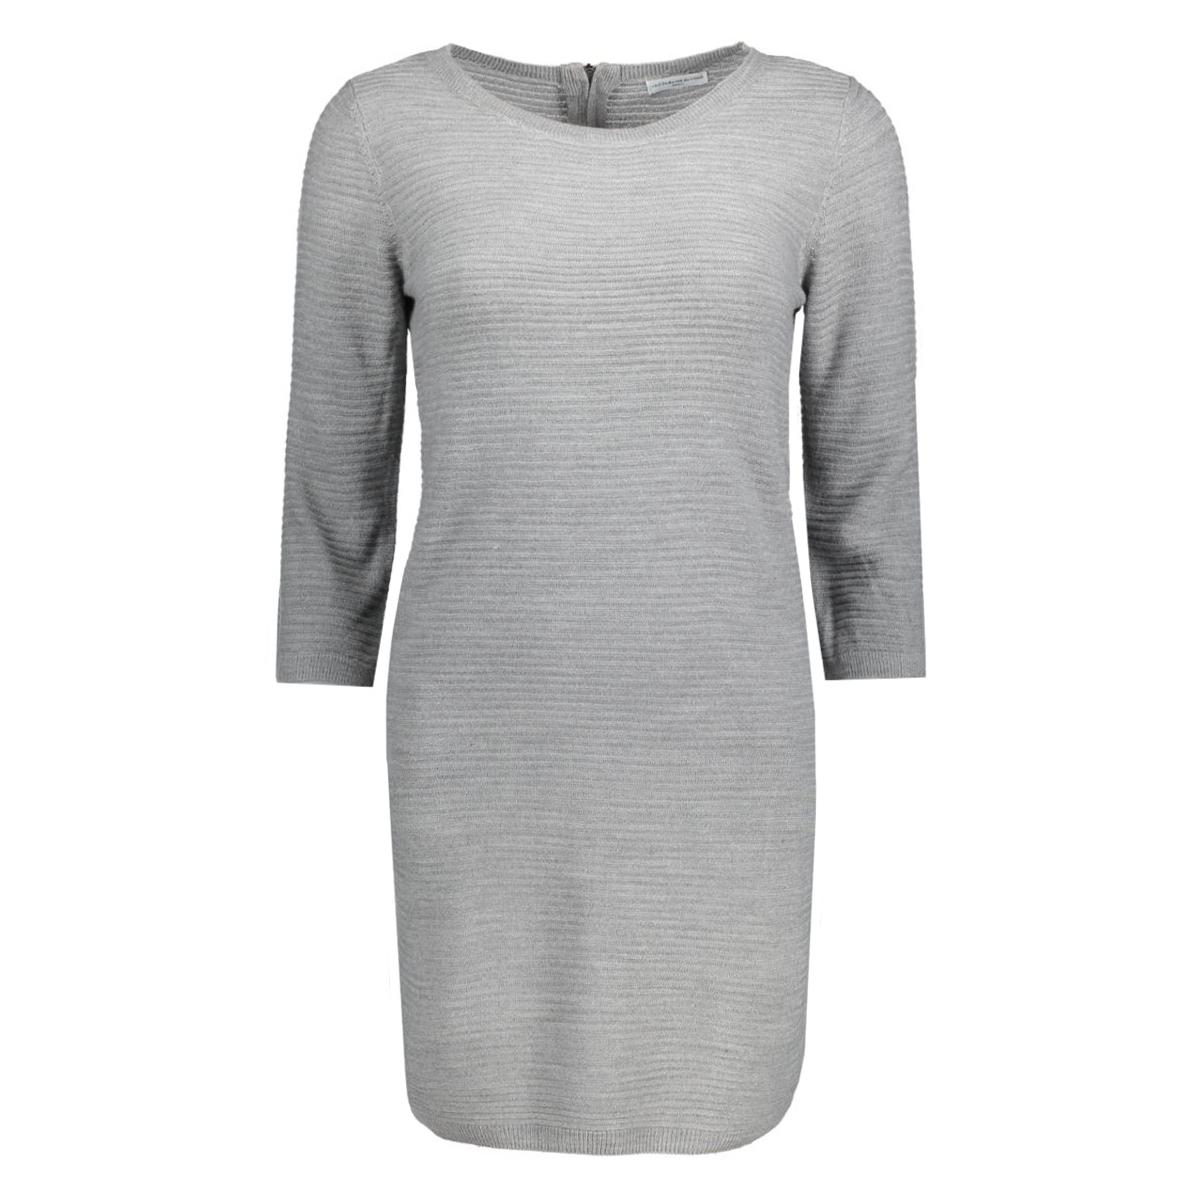 jdymathison 3/4 zip dress knt 15130606 jacqueline de yong jurk light grey melange